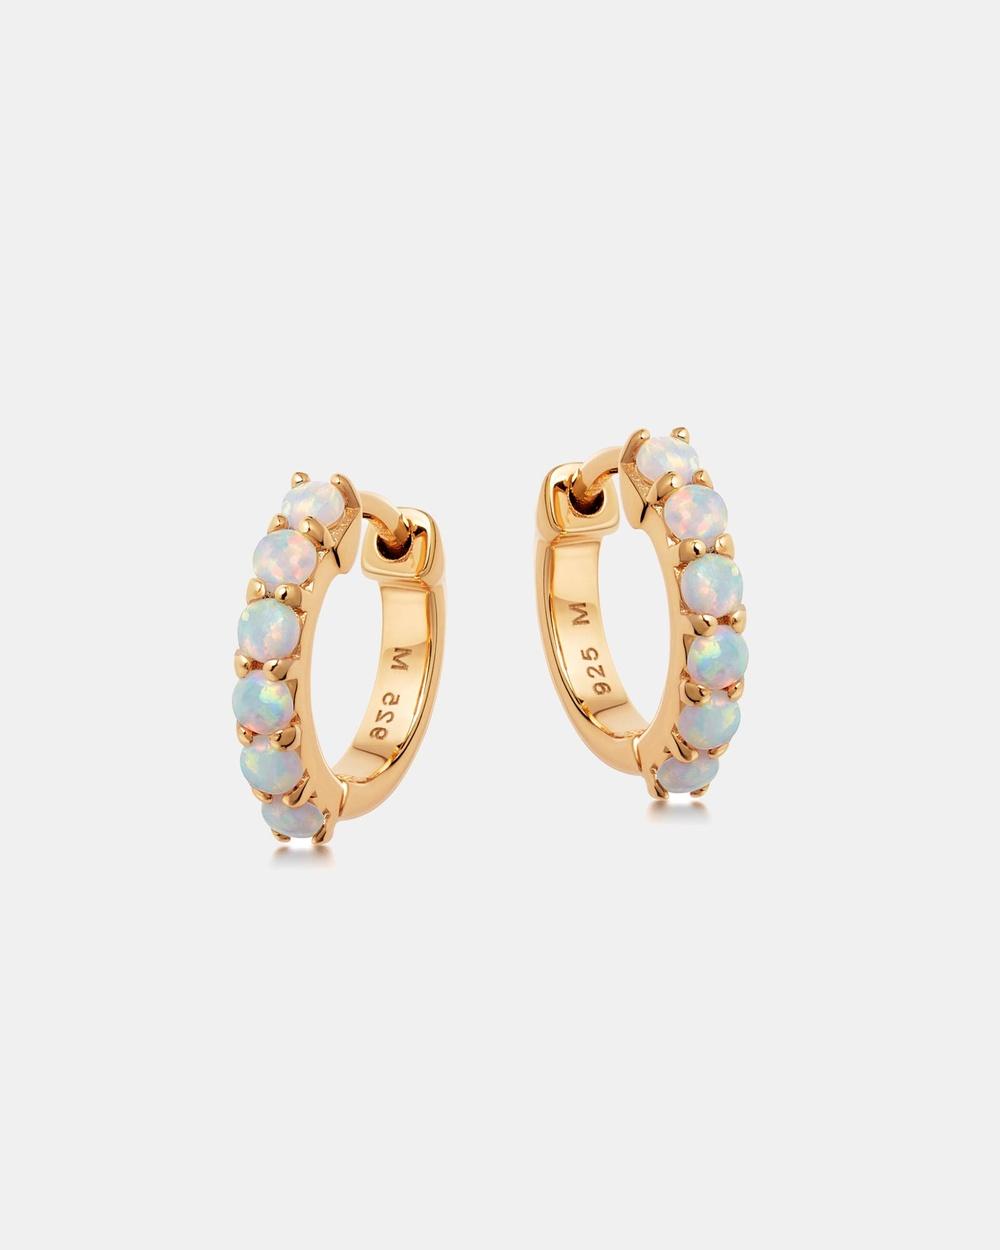 Missoma Gold Opalite Huggies Jewellery 18ct Vermeil on Sterling Silver